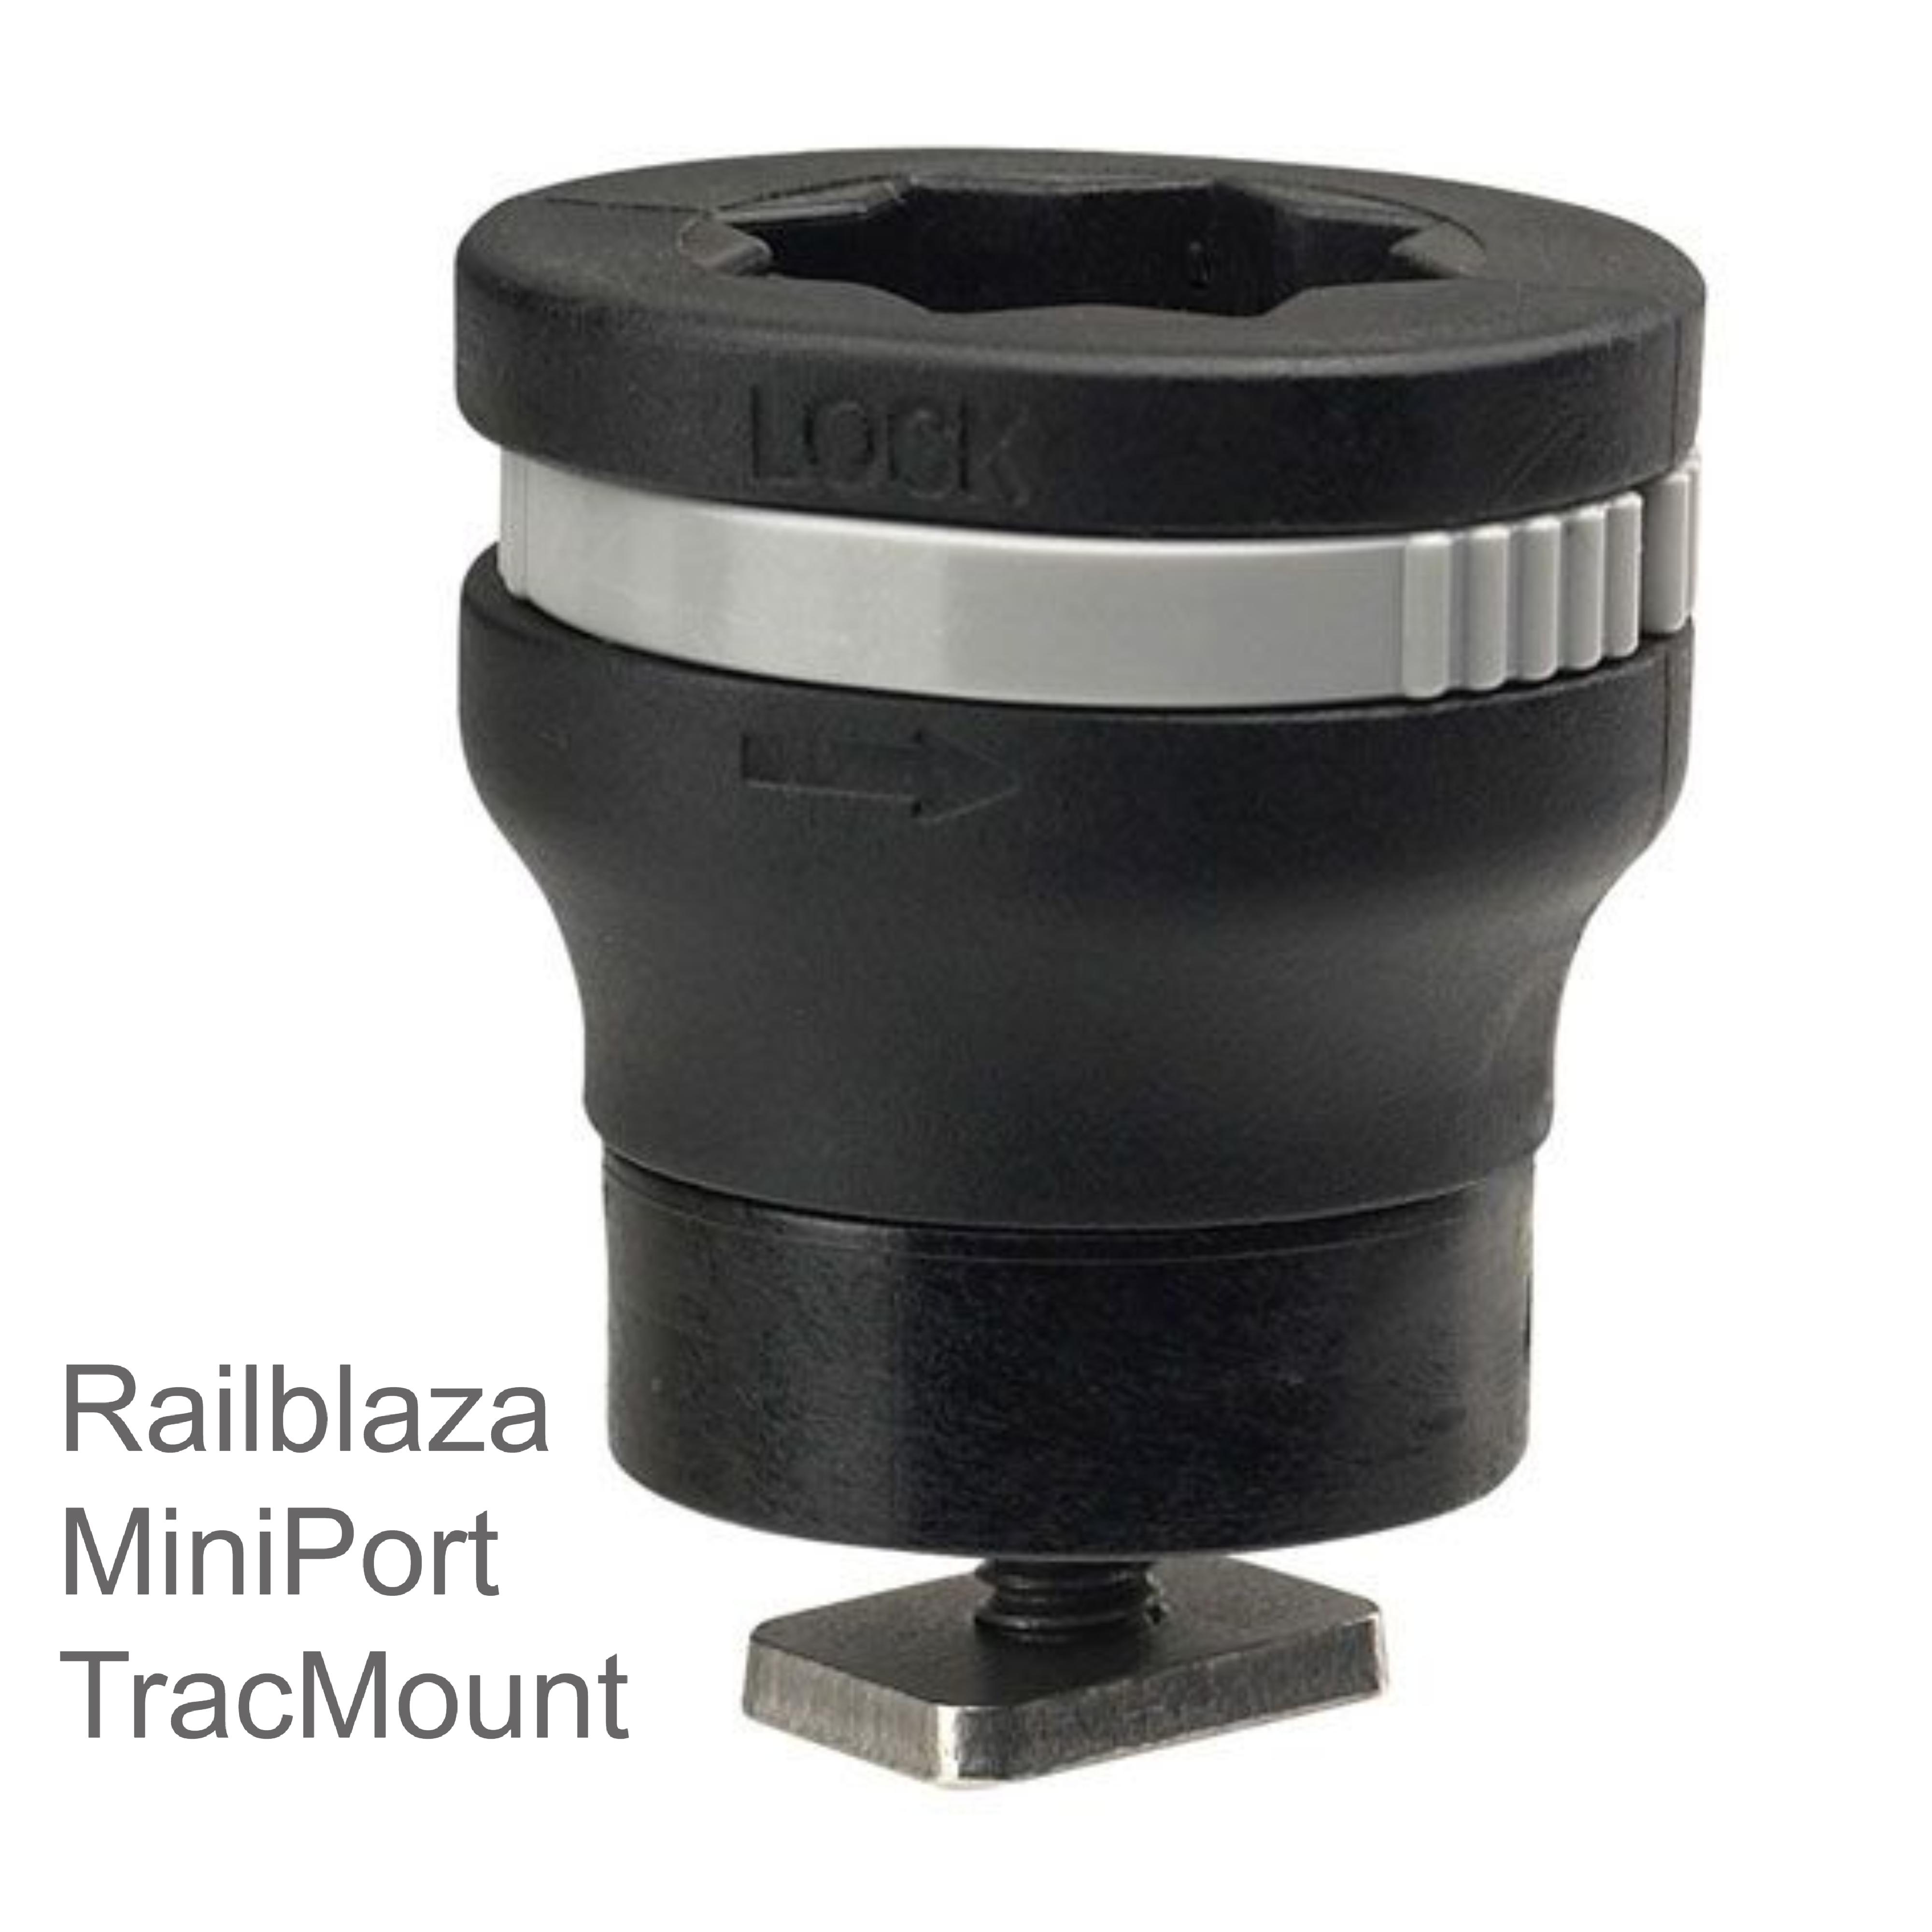 Railblaza|MiniPort TracMount|Easily Fit & Adjusted|For Watercraft-YakAttack